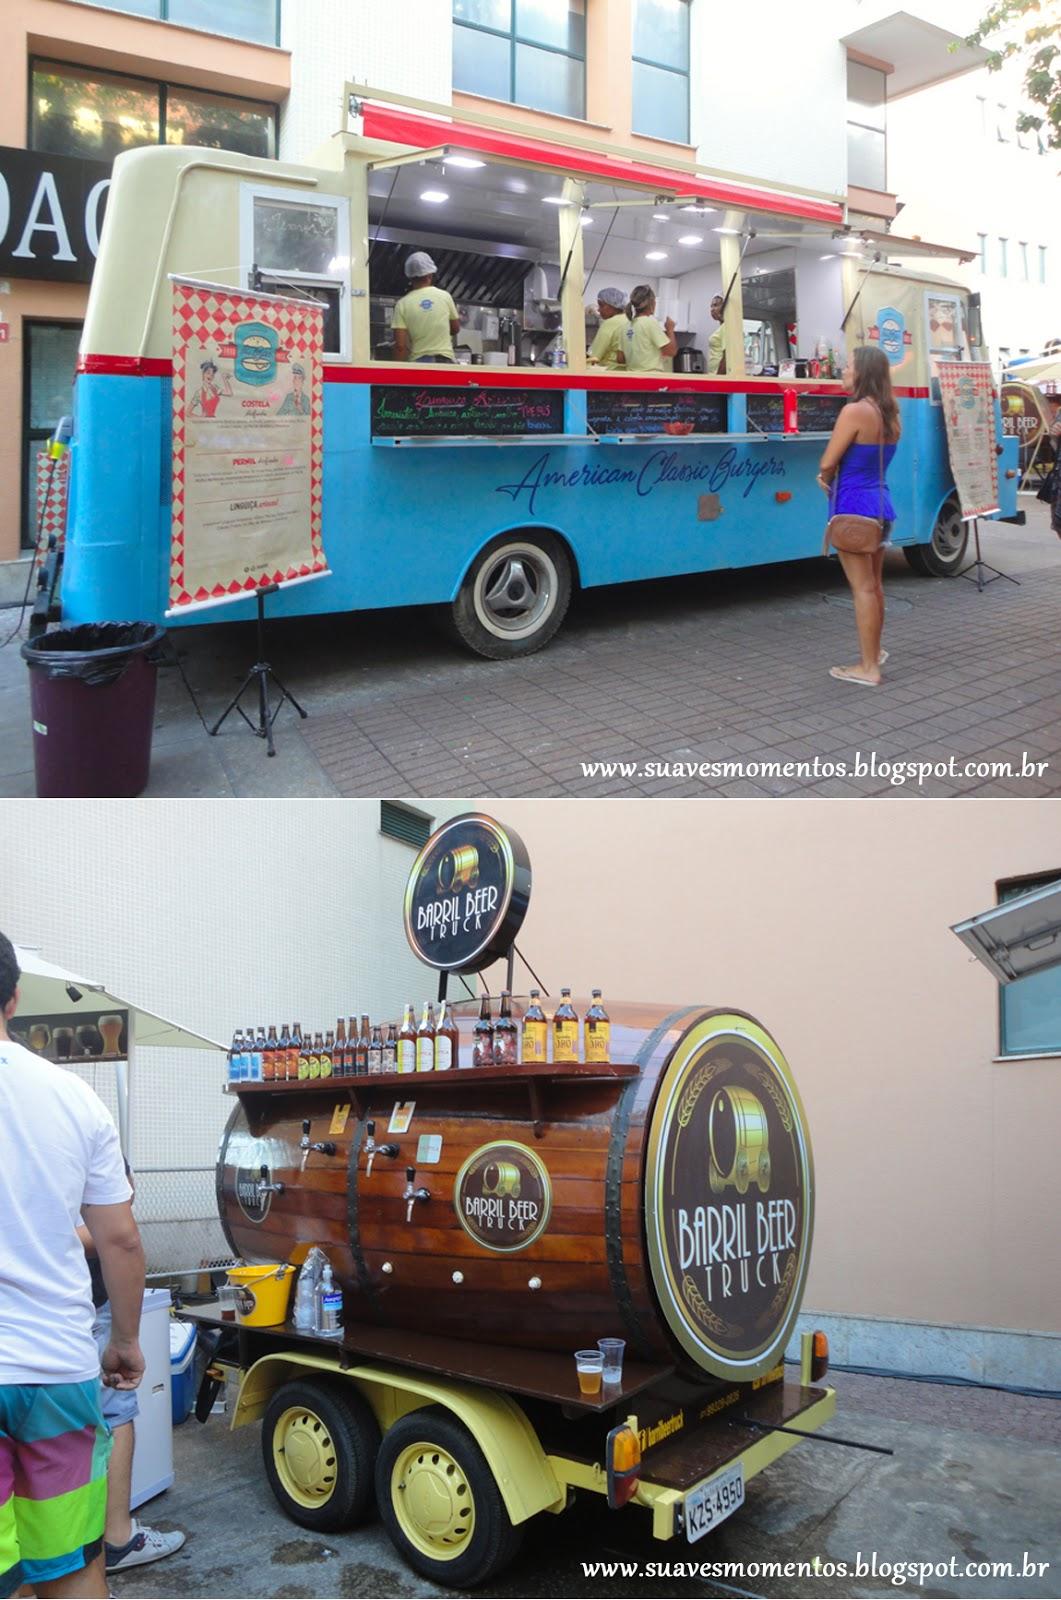 Babilônia Feira Hype e Food Truck